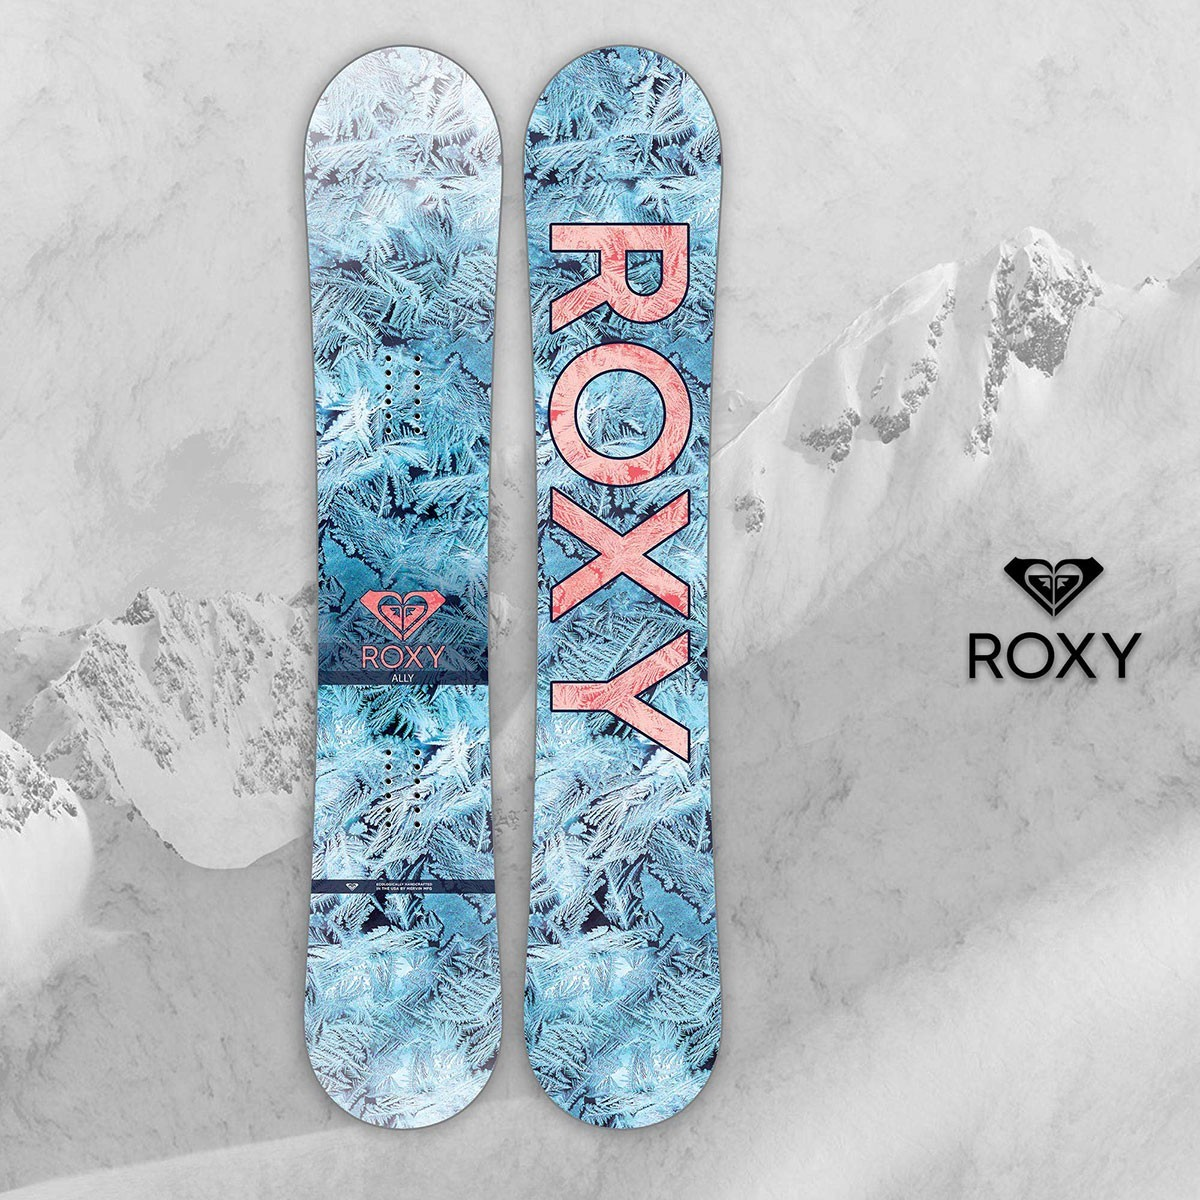 ROXY ALLY BANANA - Изображение - AQUAMATRIX